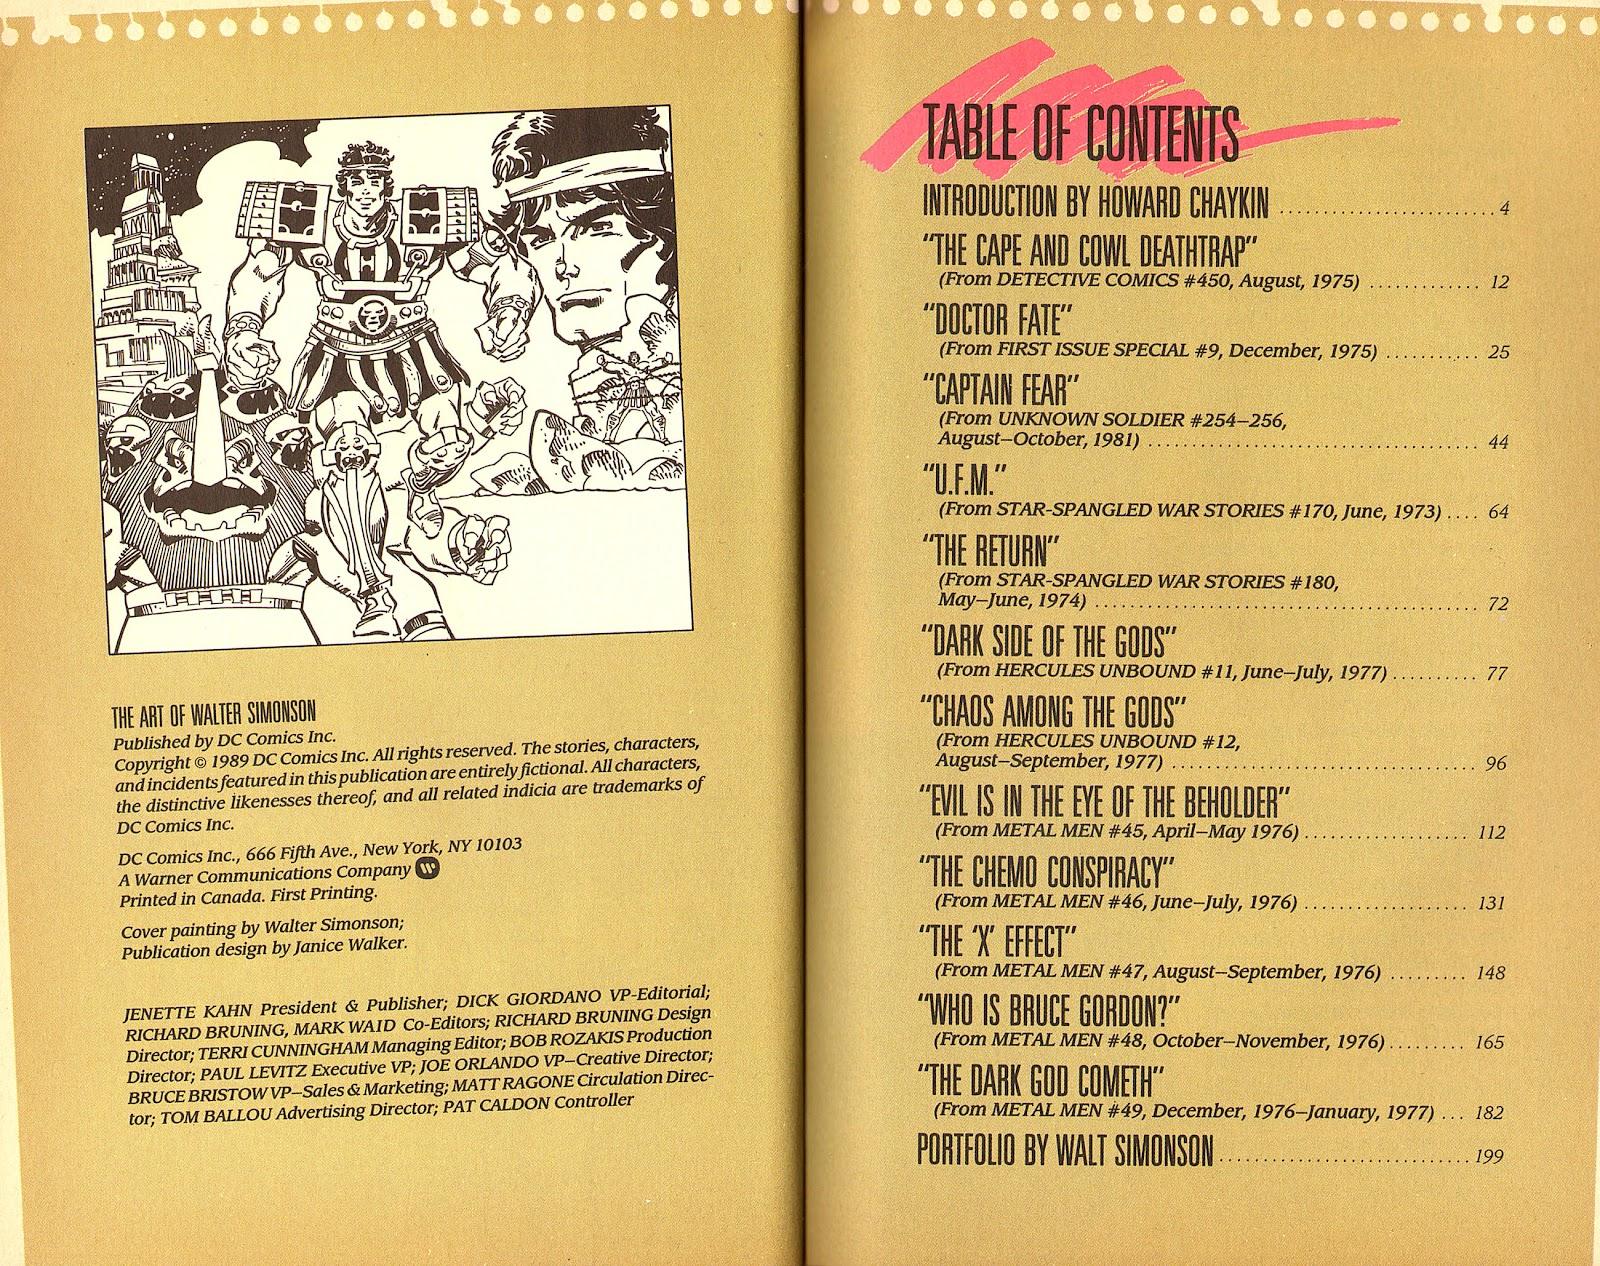 Read online The Art of Walter Simonson comic -  Issue # TPB - 3